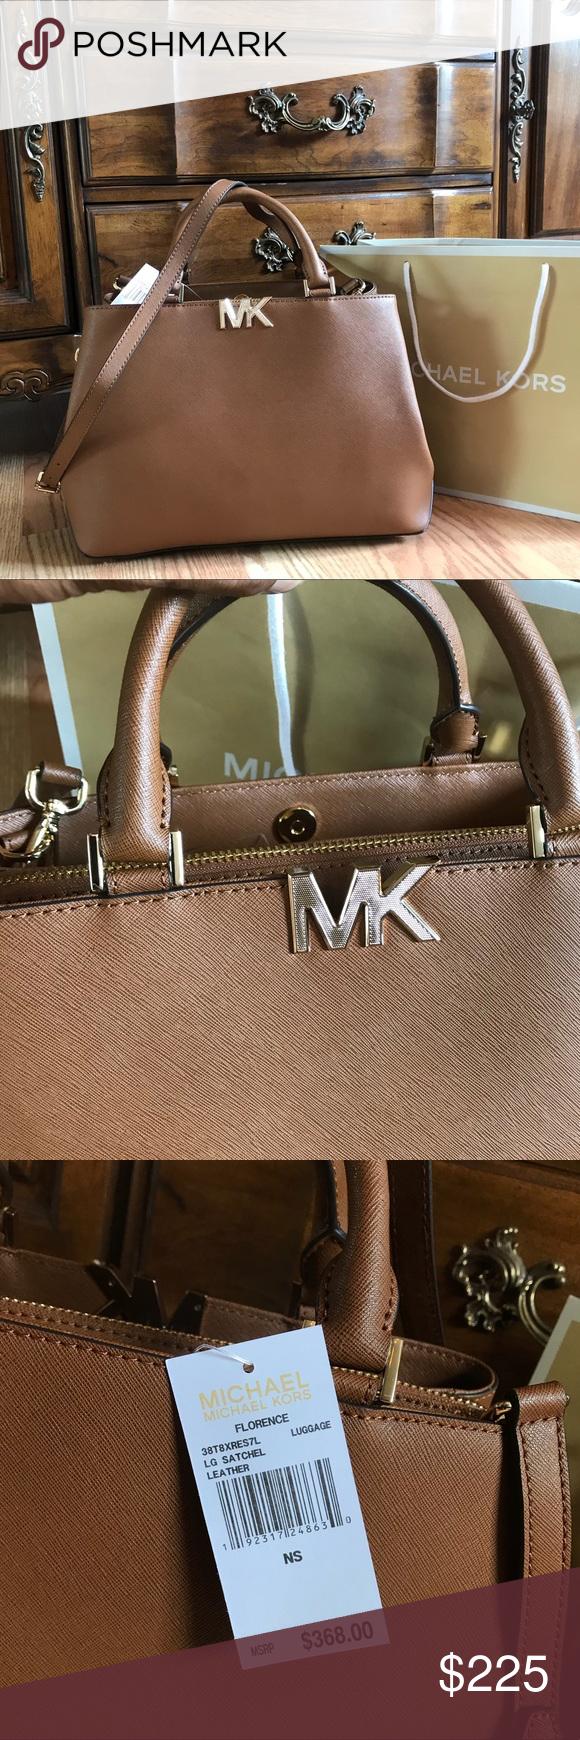 7789a12fc07a $368 Michael Kors Florence Bag MK Purse Handbag 🔥⏳ LAST 1! ⏳🔥 Guaranteed